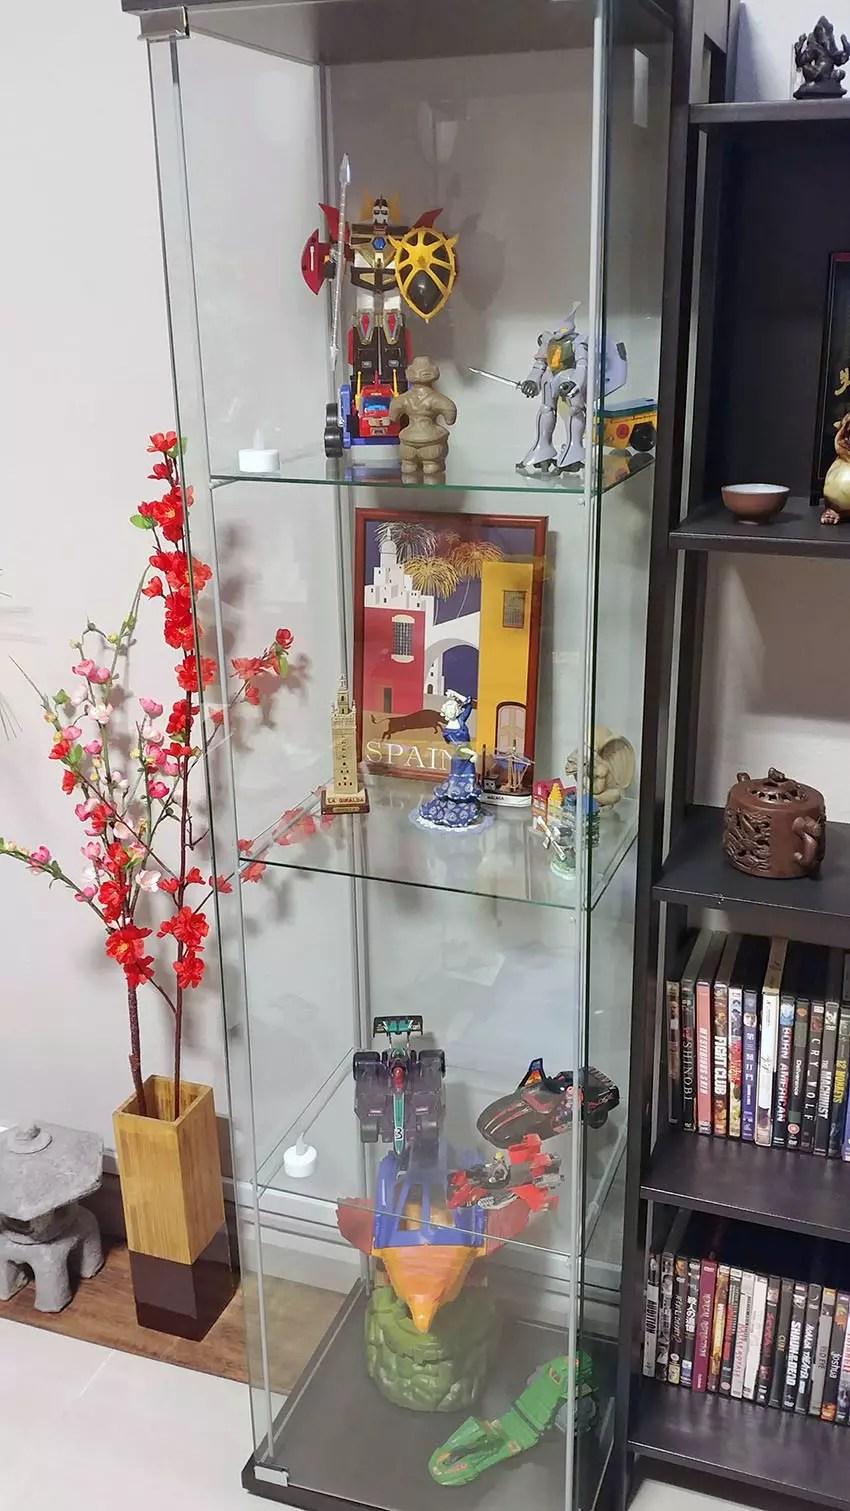 My First Geek Display Cabinet